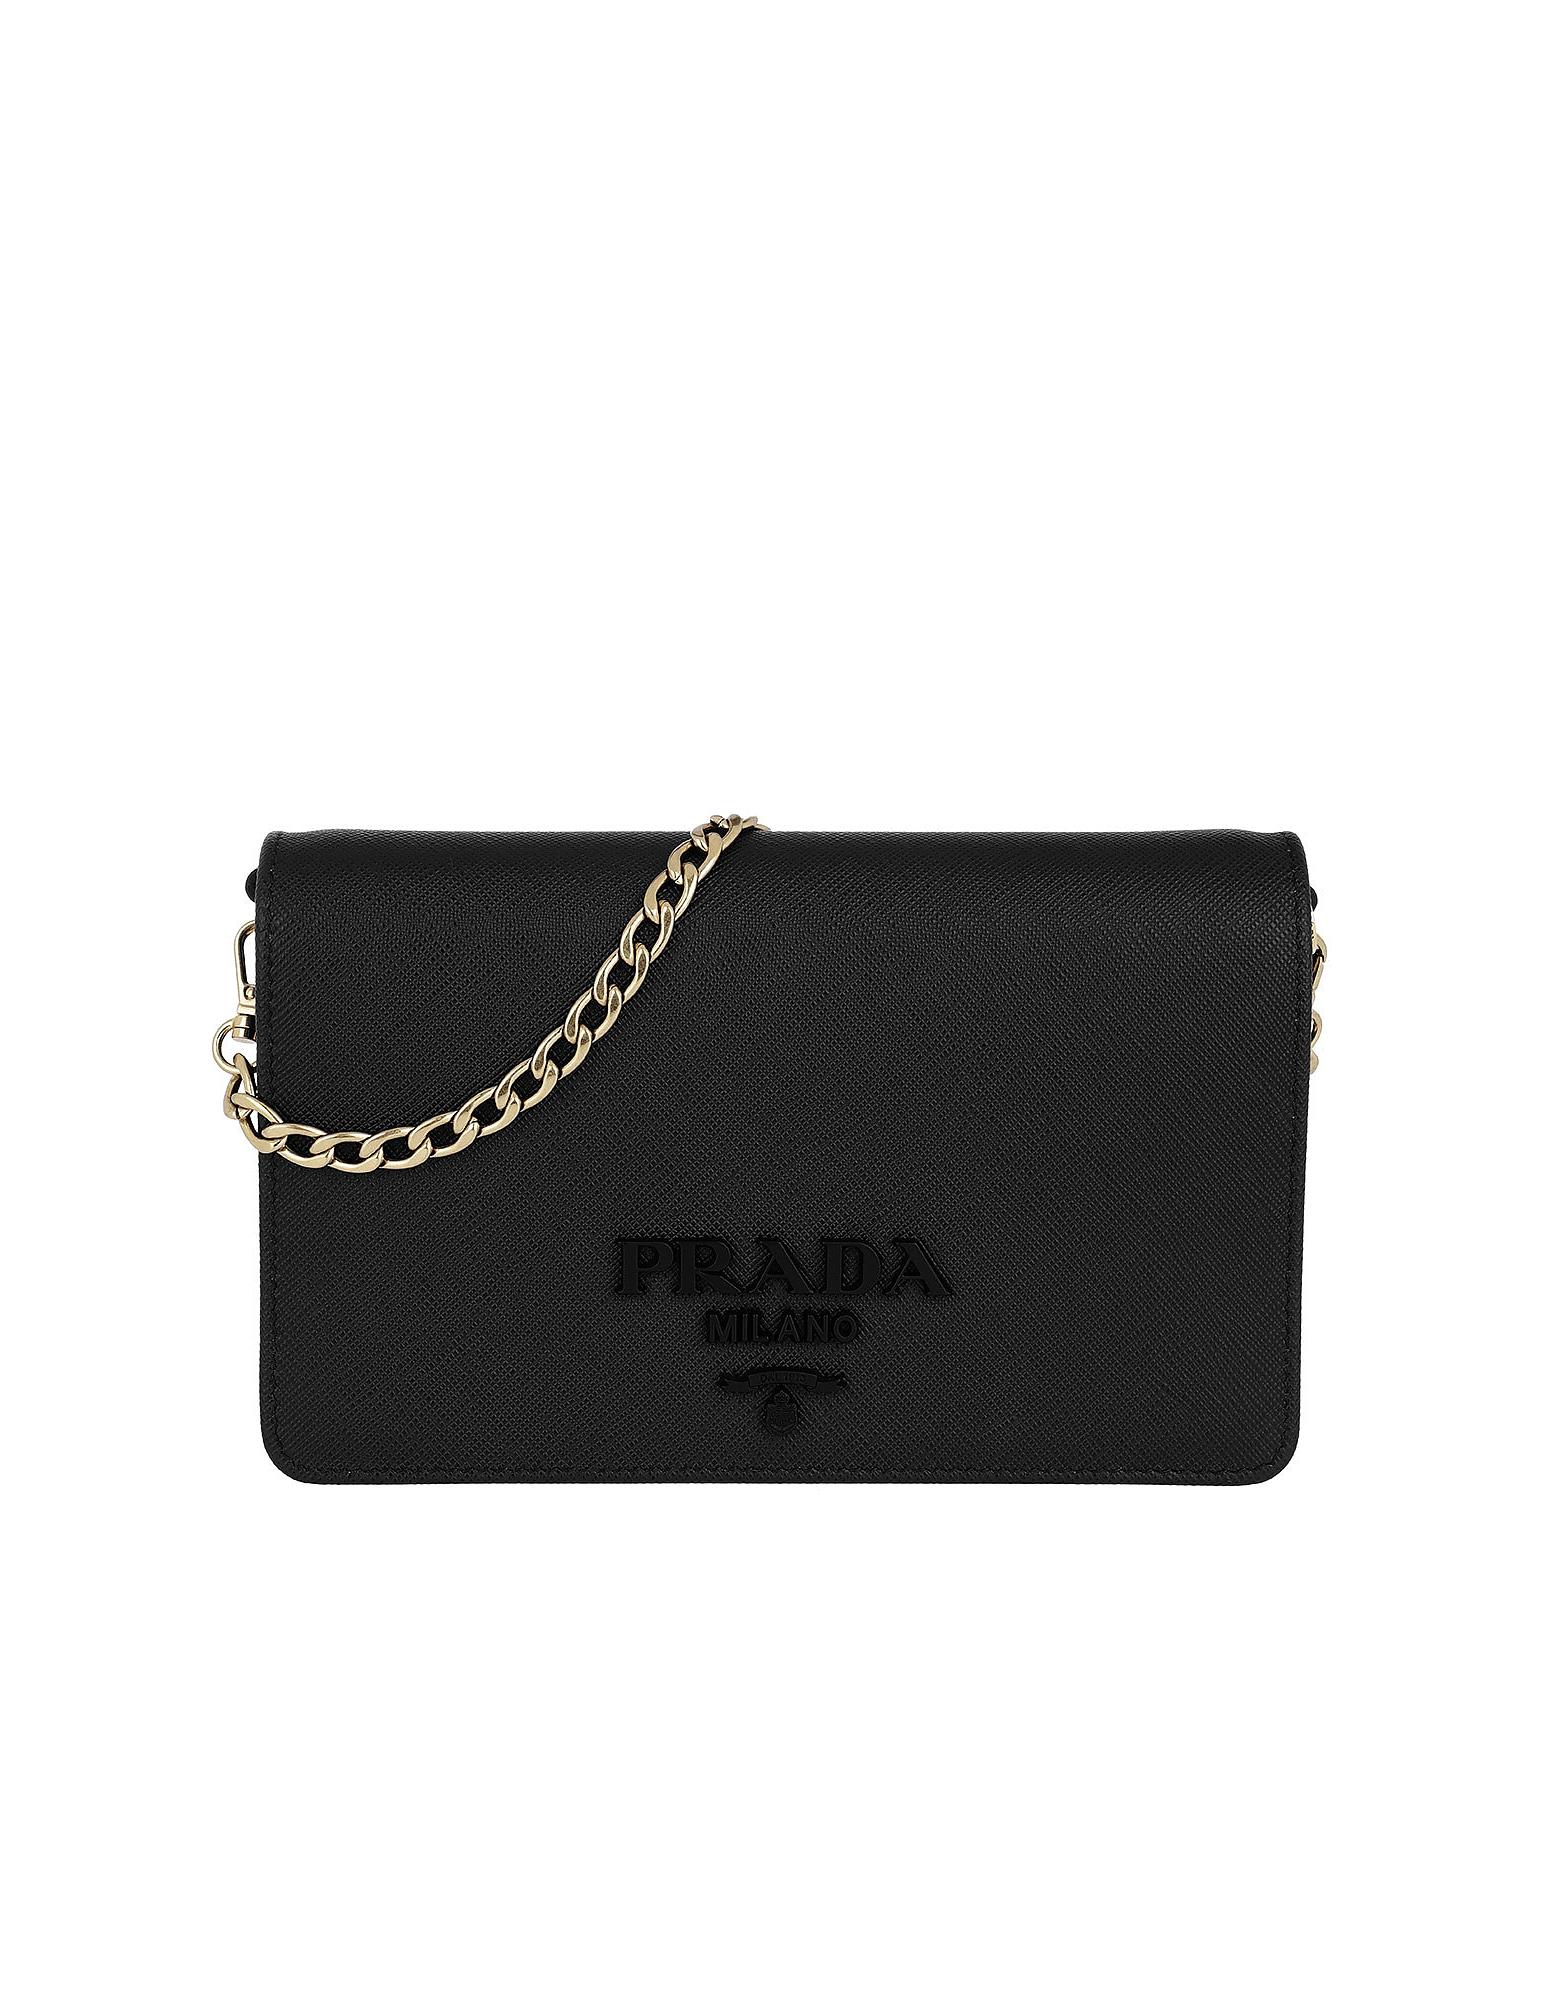 Prada Handbags, Saffiano Lux Crossbody Calf Leather Black